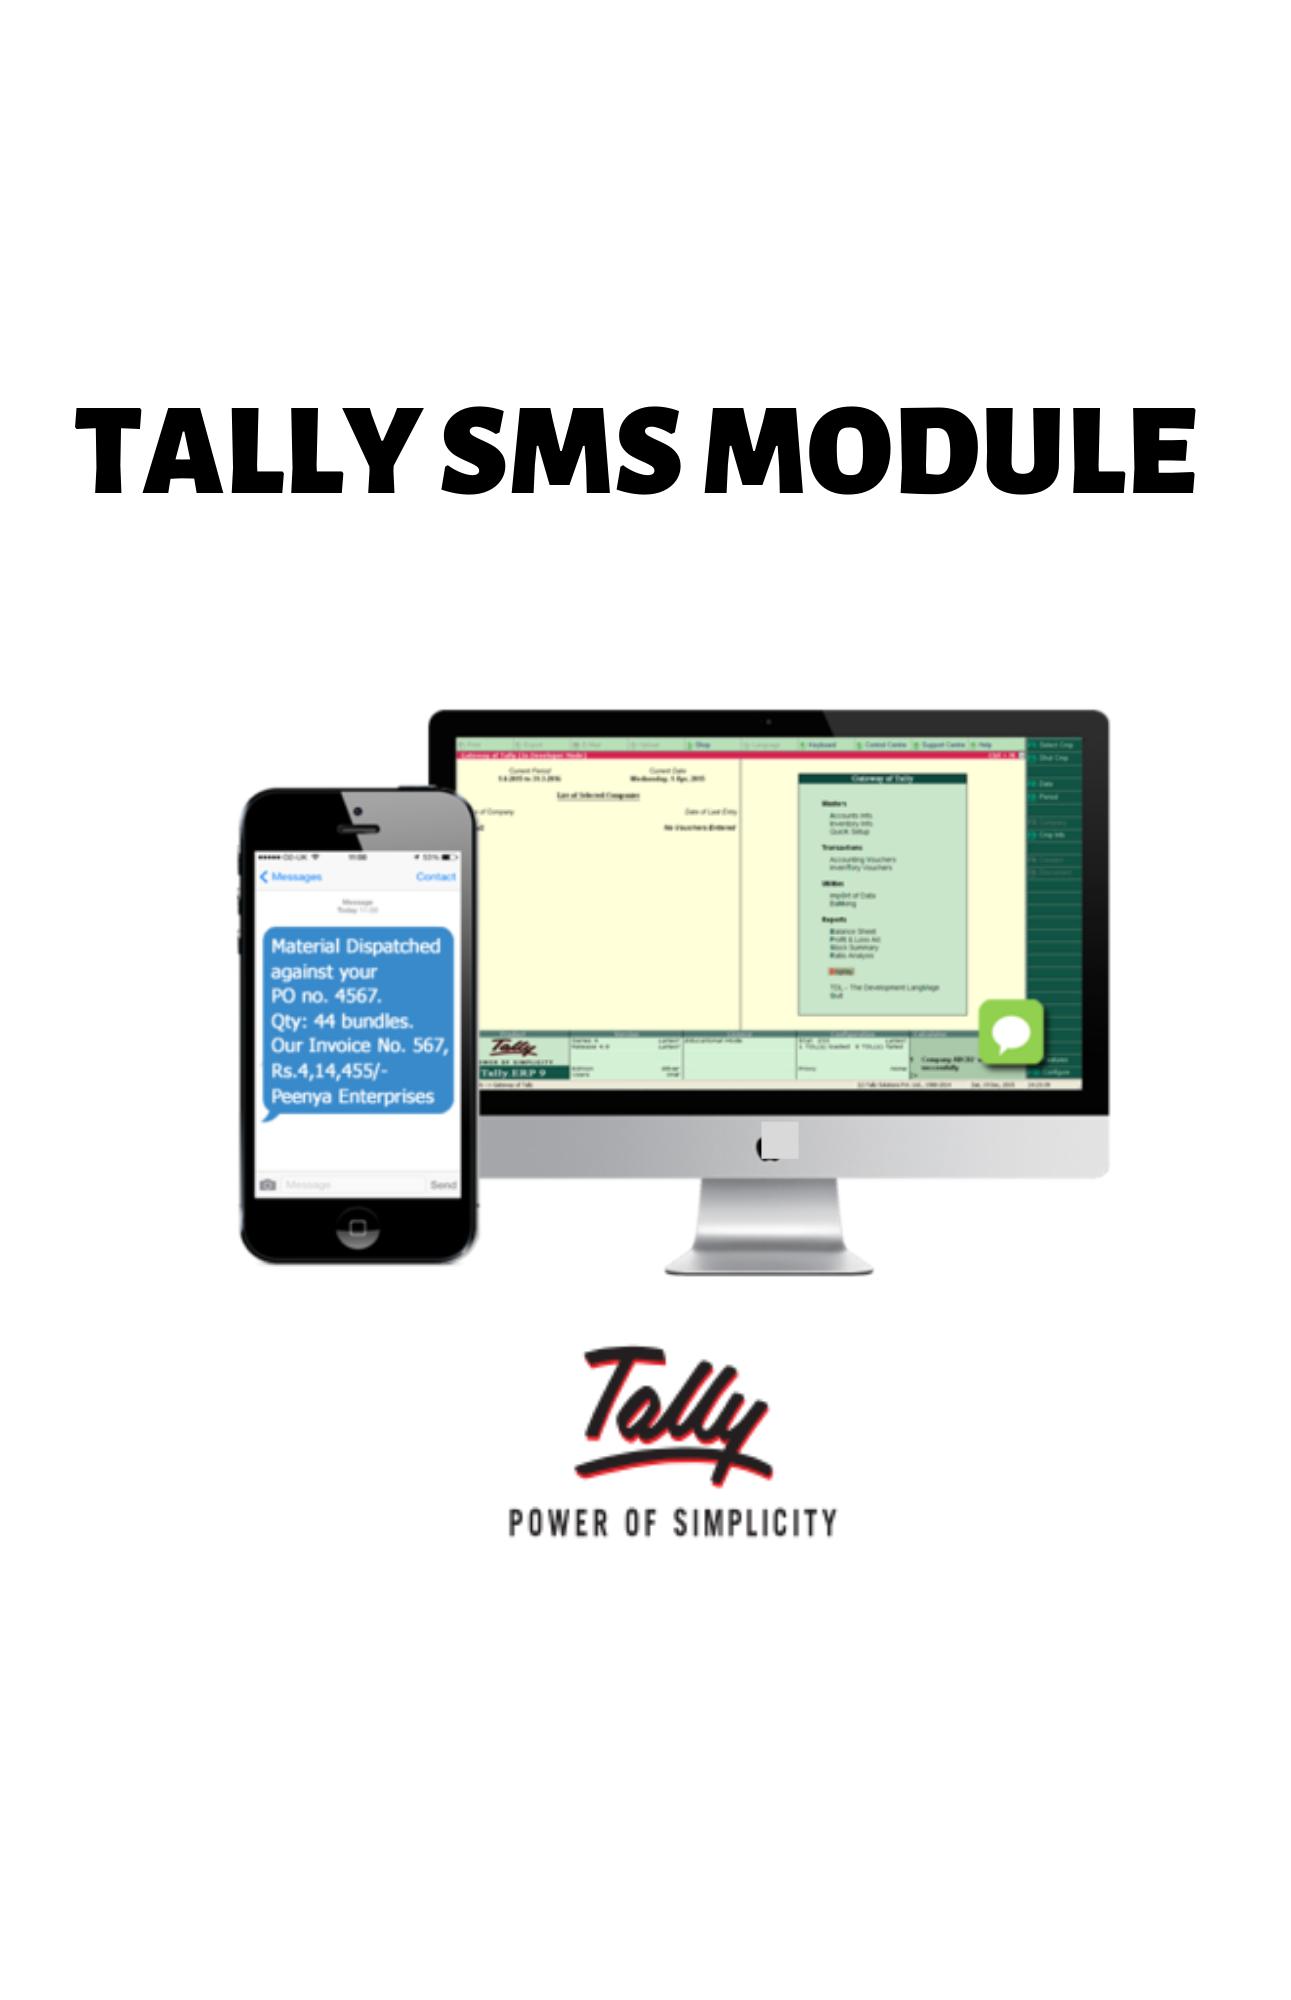 Tally SMS Module